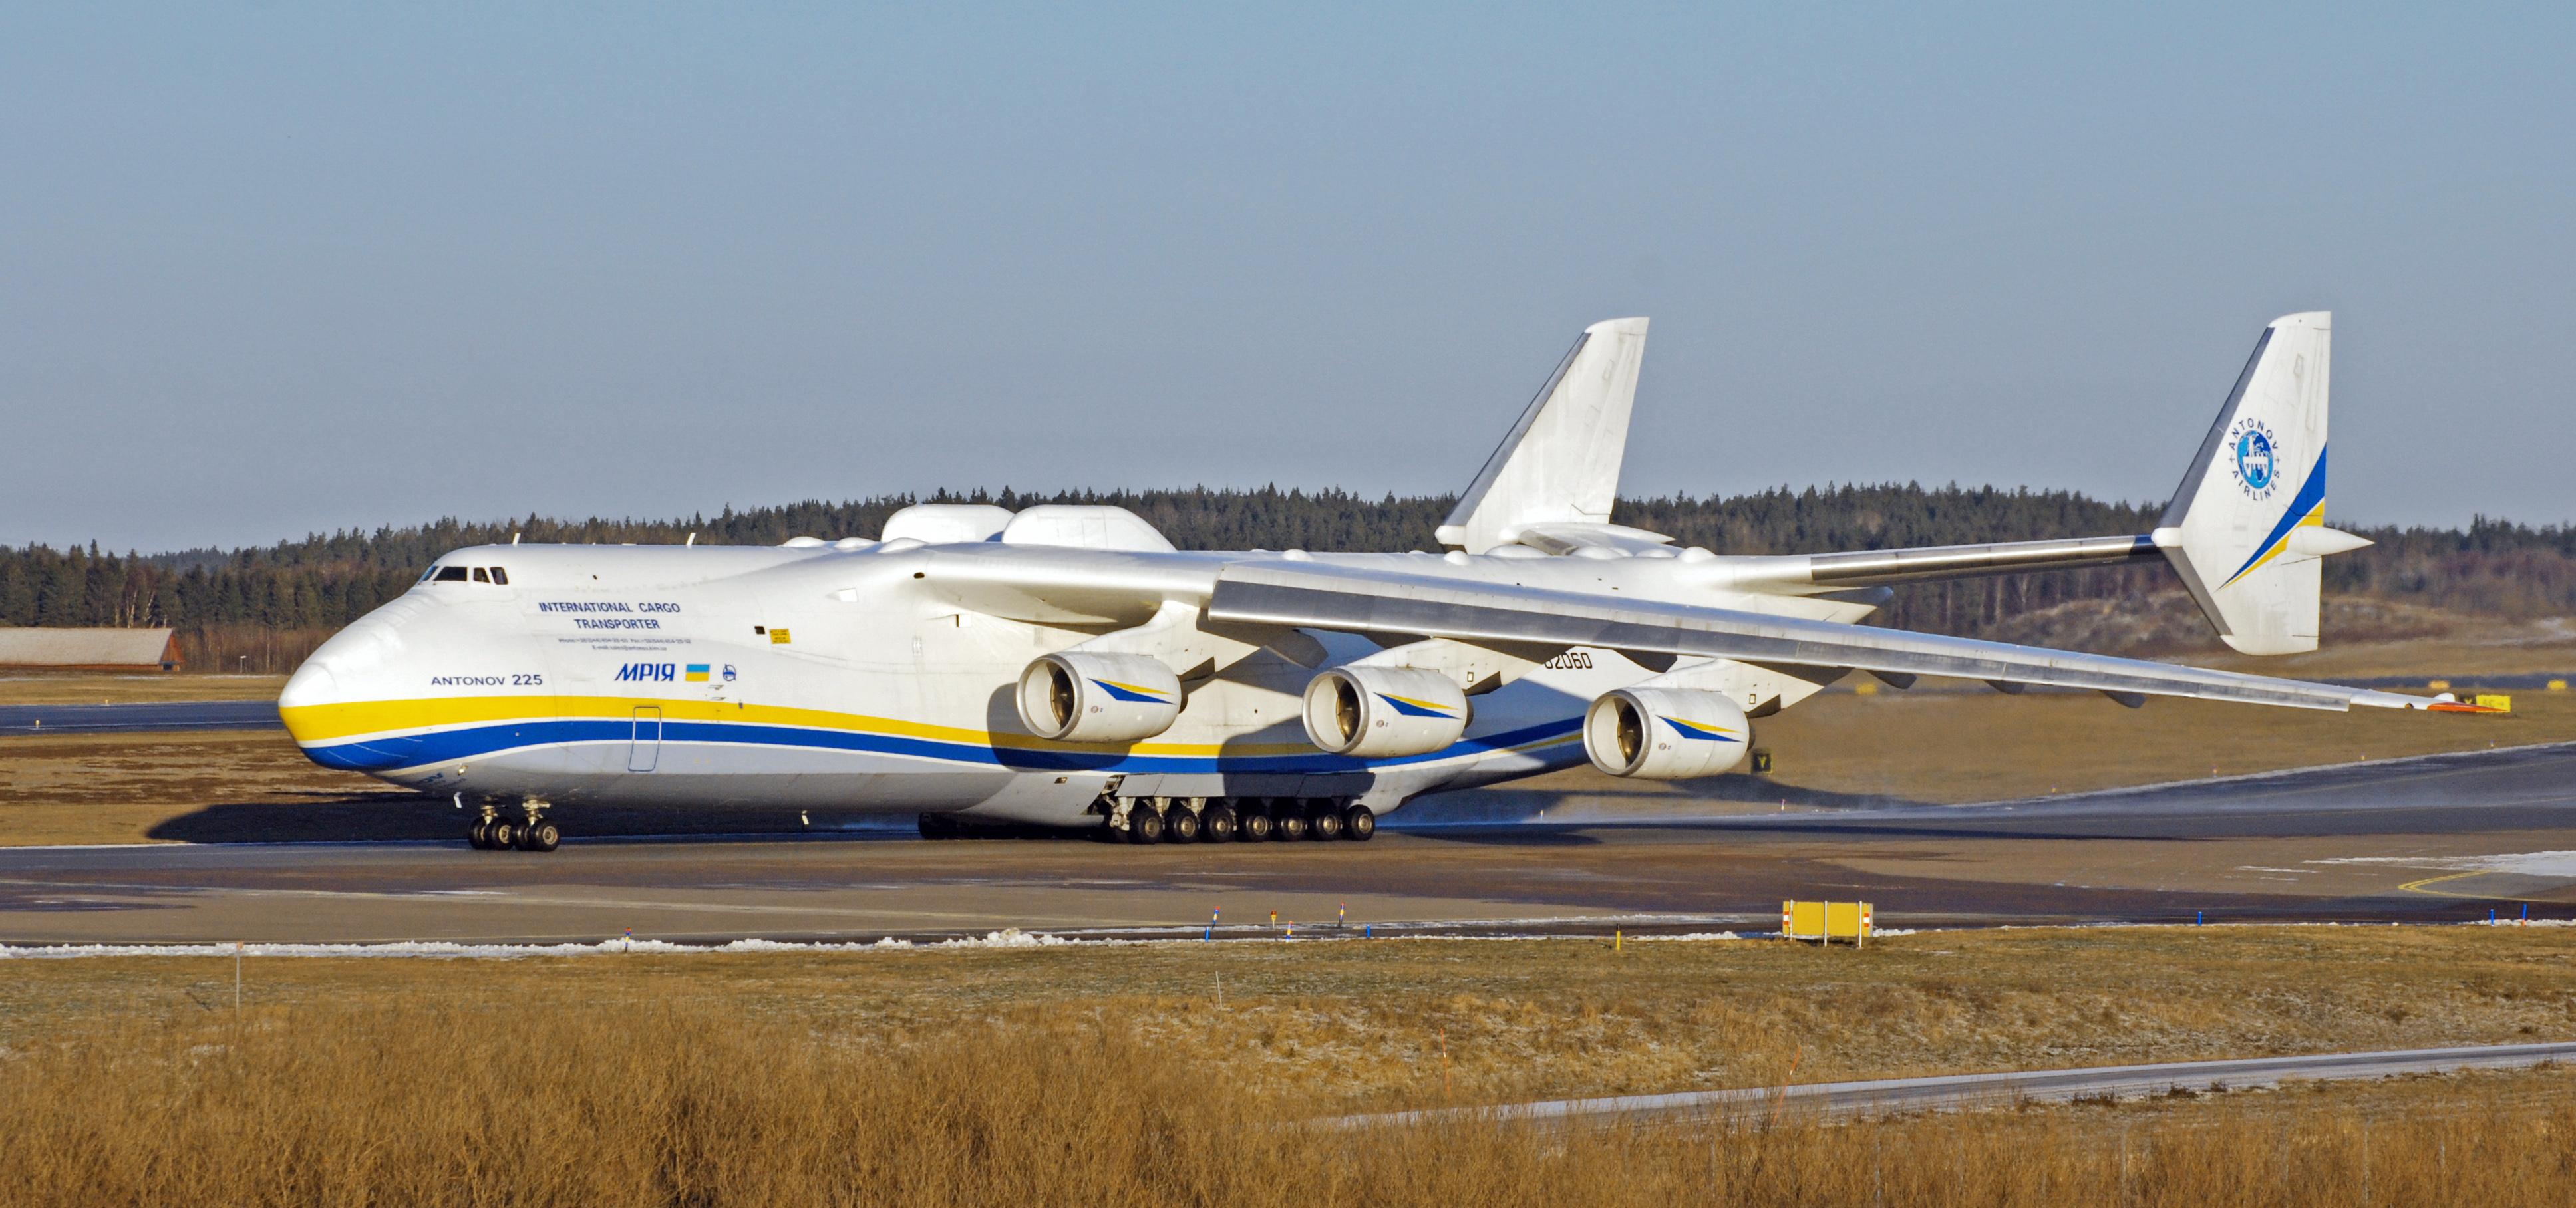 An-225 Mriya, propus de Kiev statelor NATO